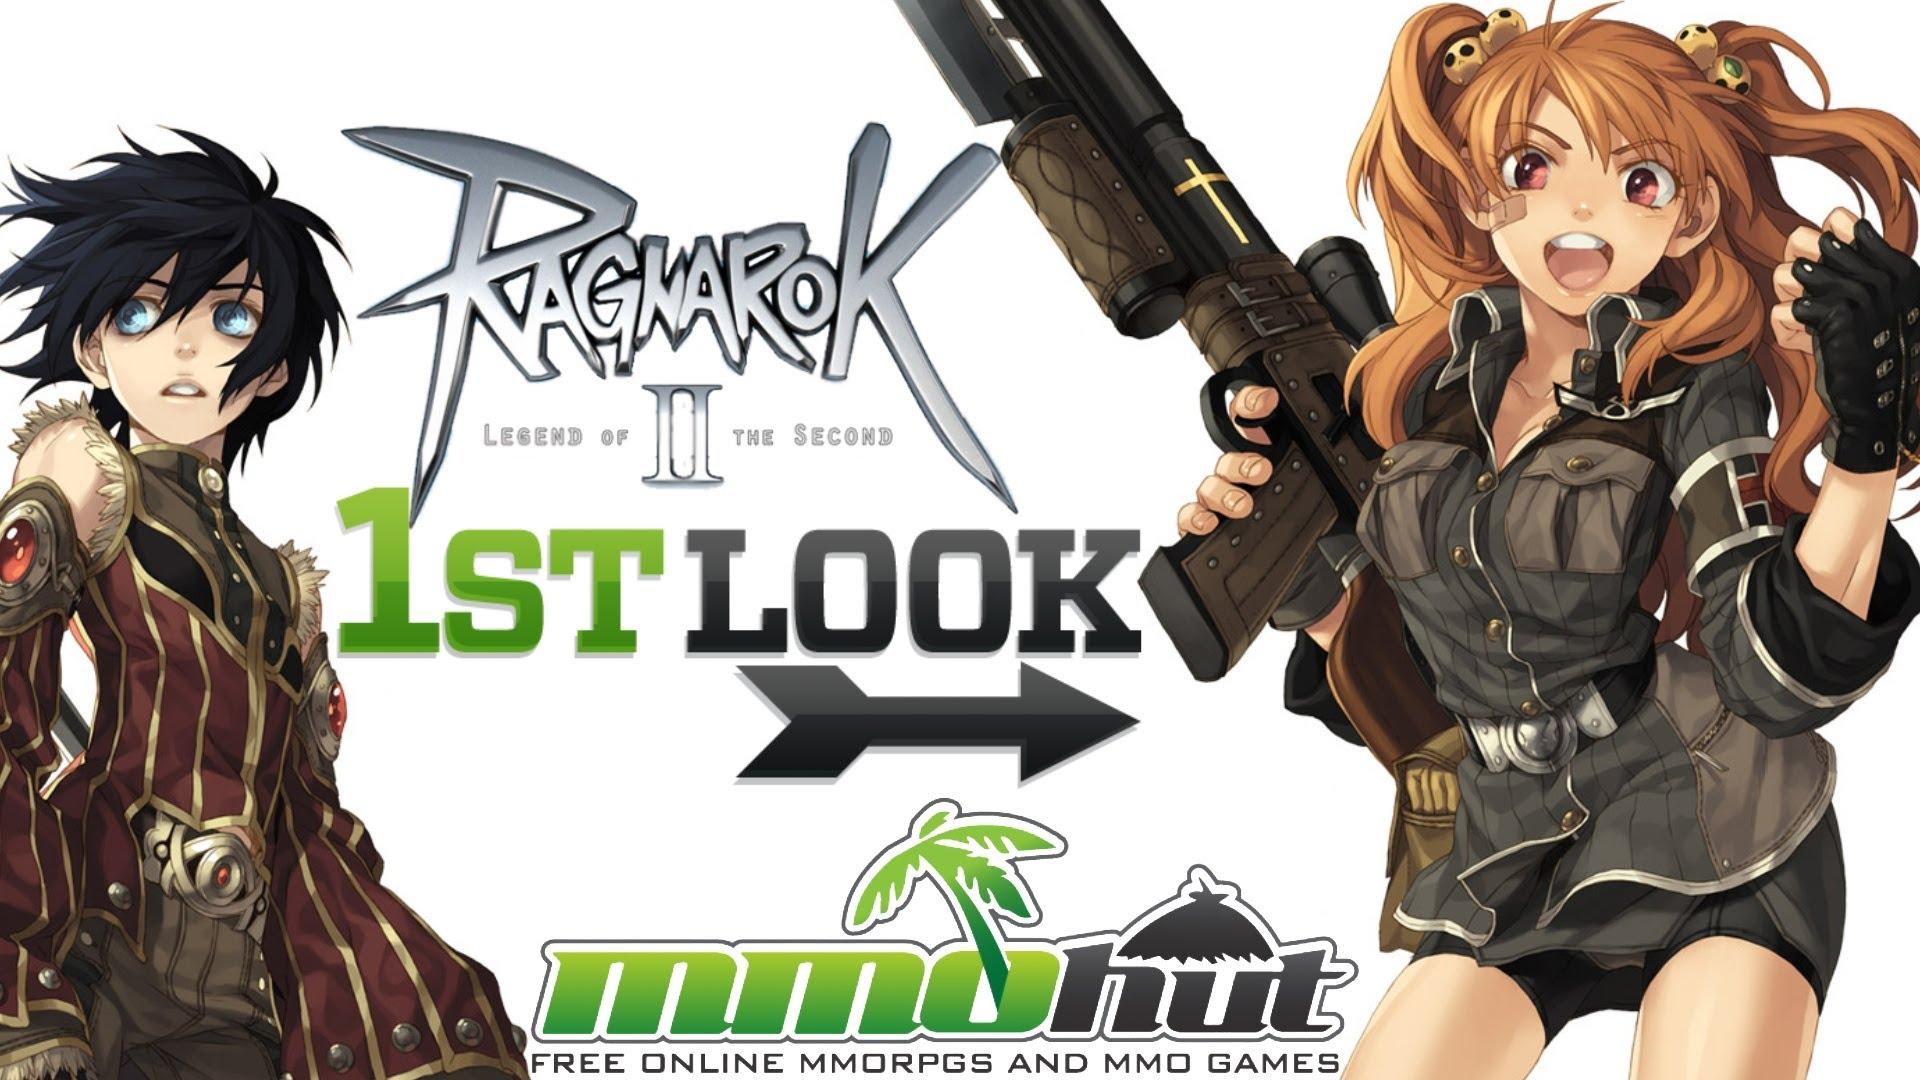 Ragnarok Online 2 - First Look Video Thumbnail